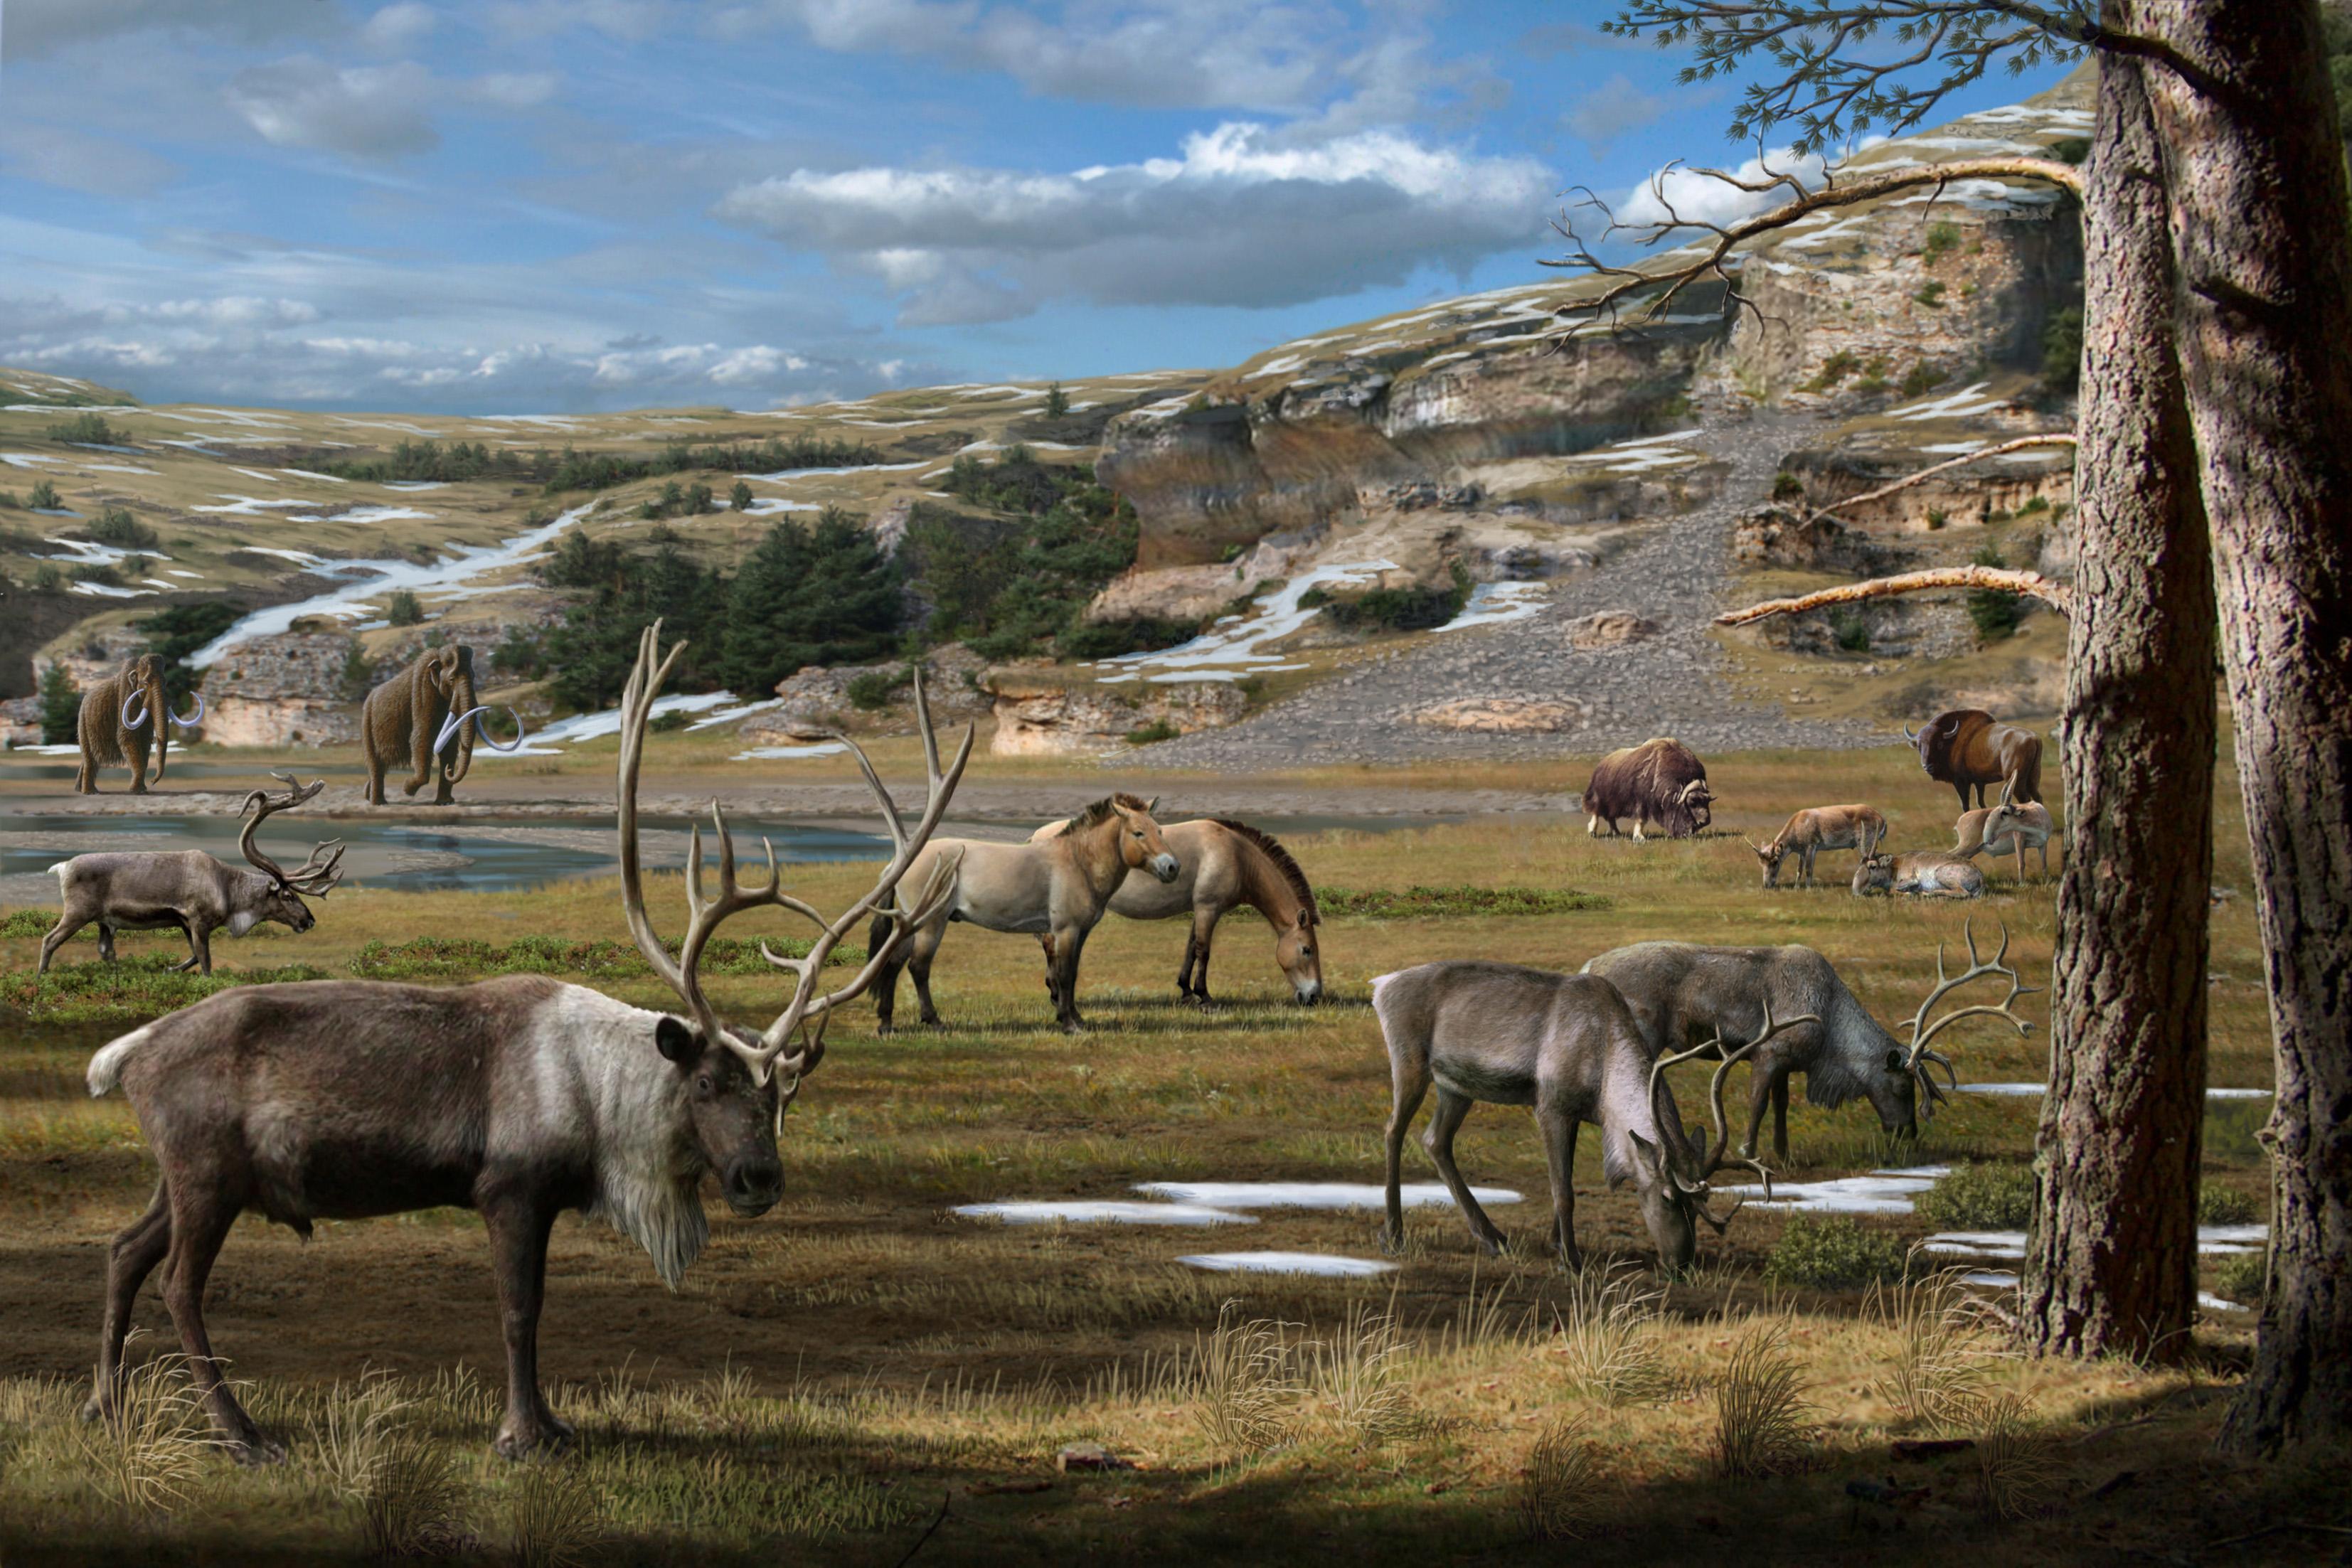 megafauna The latest tweets from megafauna (@mega_fauna) megafauna, il solito leccapensieri col mare dentro - contessa medaglini gondwana.